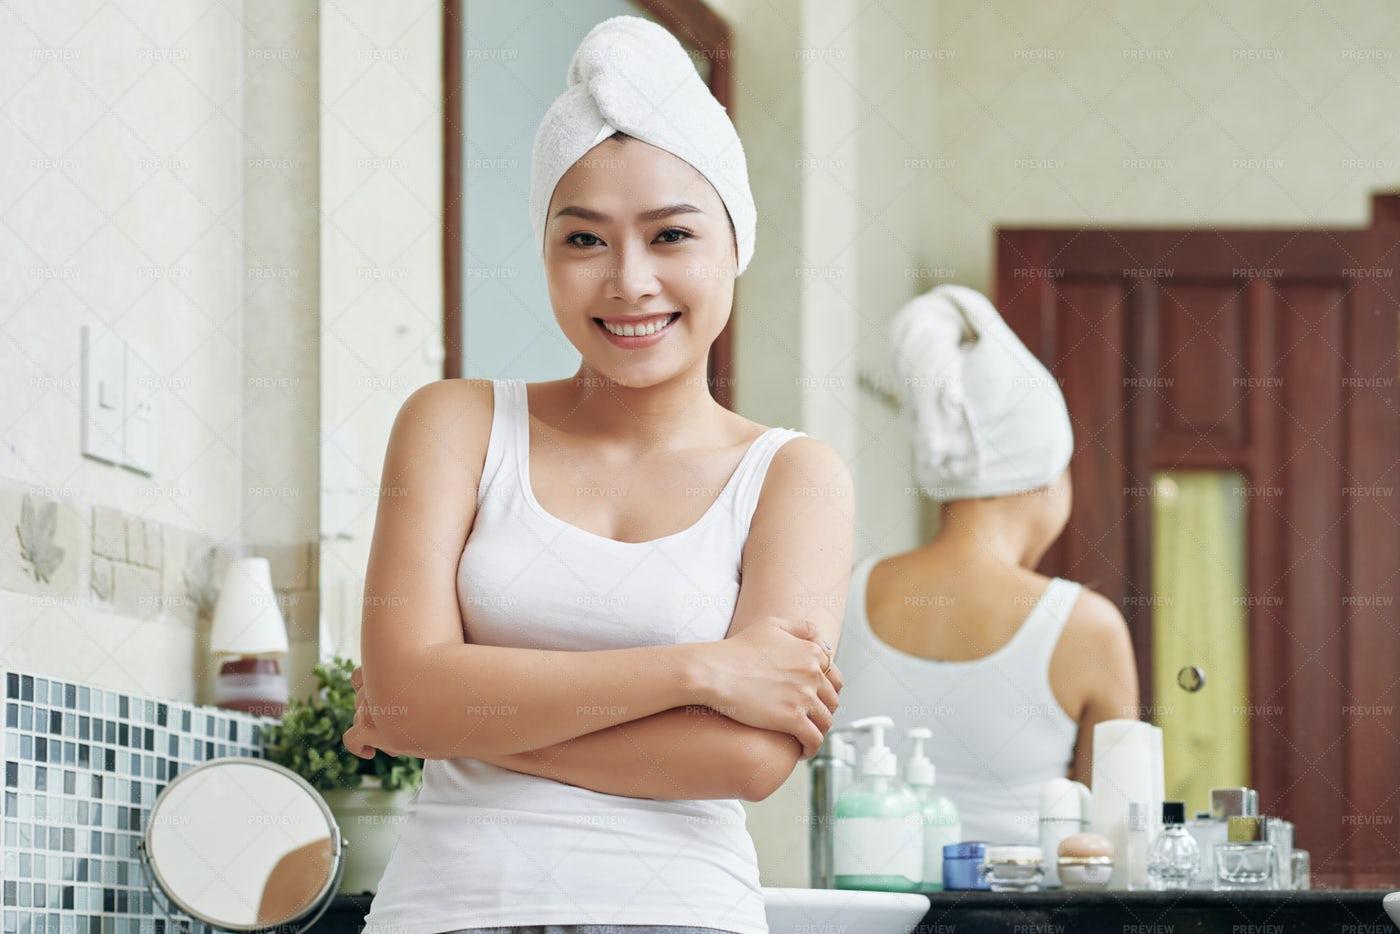 Ethnic Woman Standing In Bathroom: Stock Photos